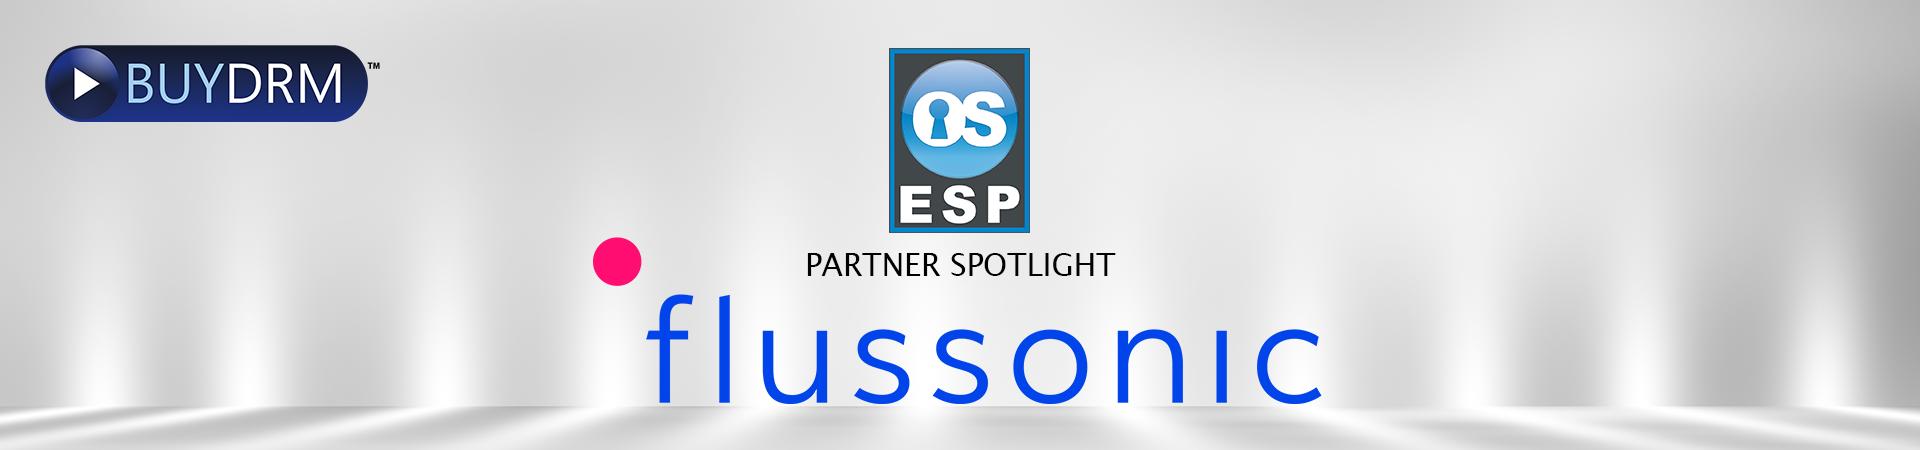 ESPPartnerSpotlight_Flussonic_1920x450